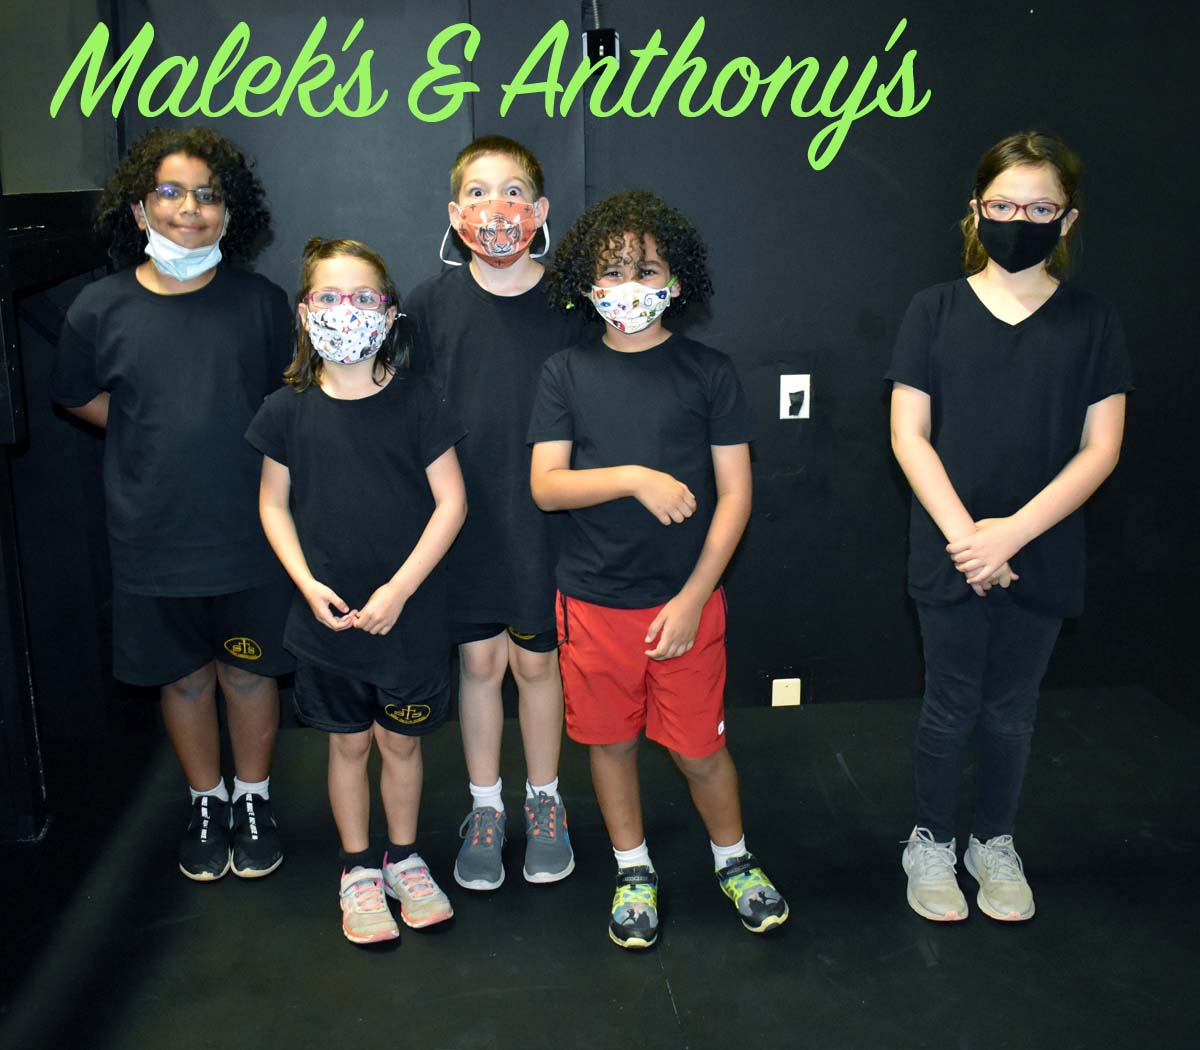 malek and anothony referral